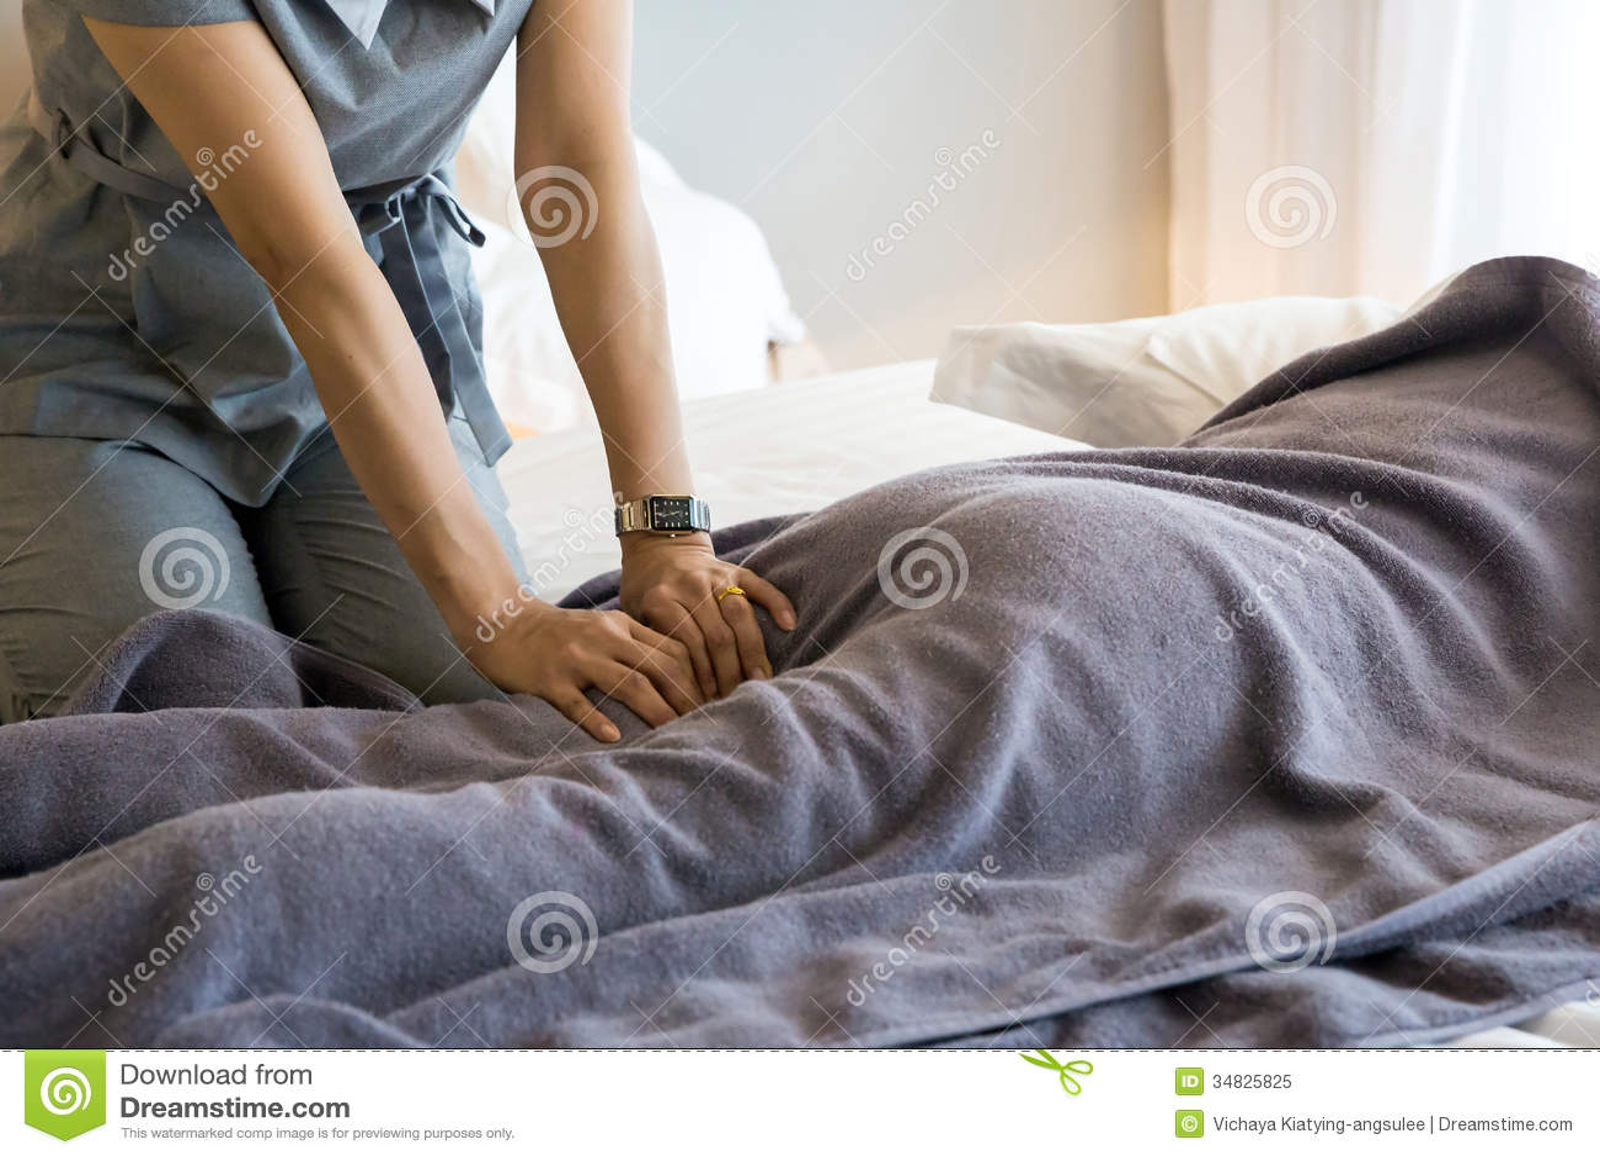 Getting Massage